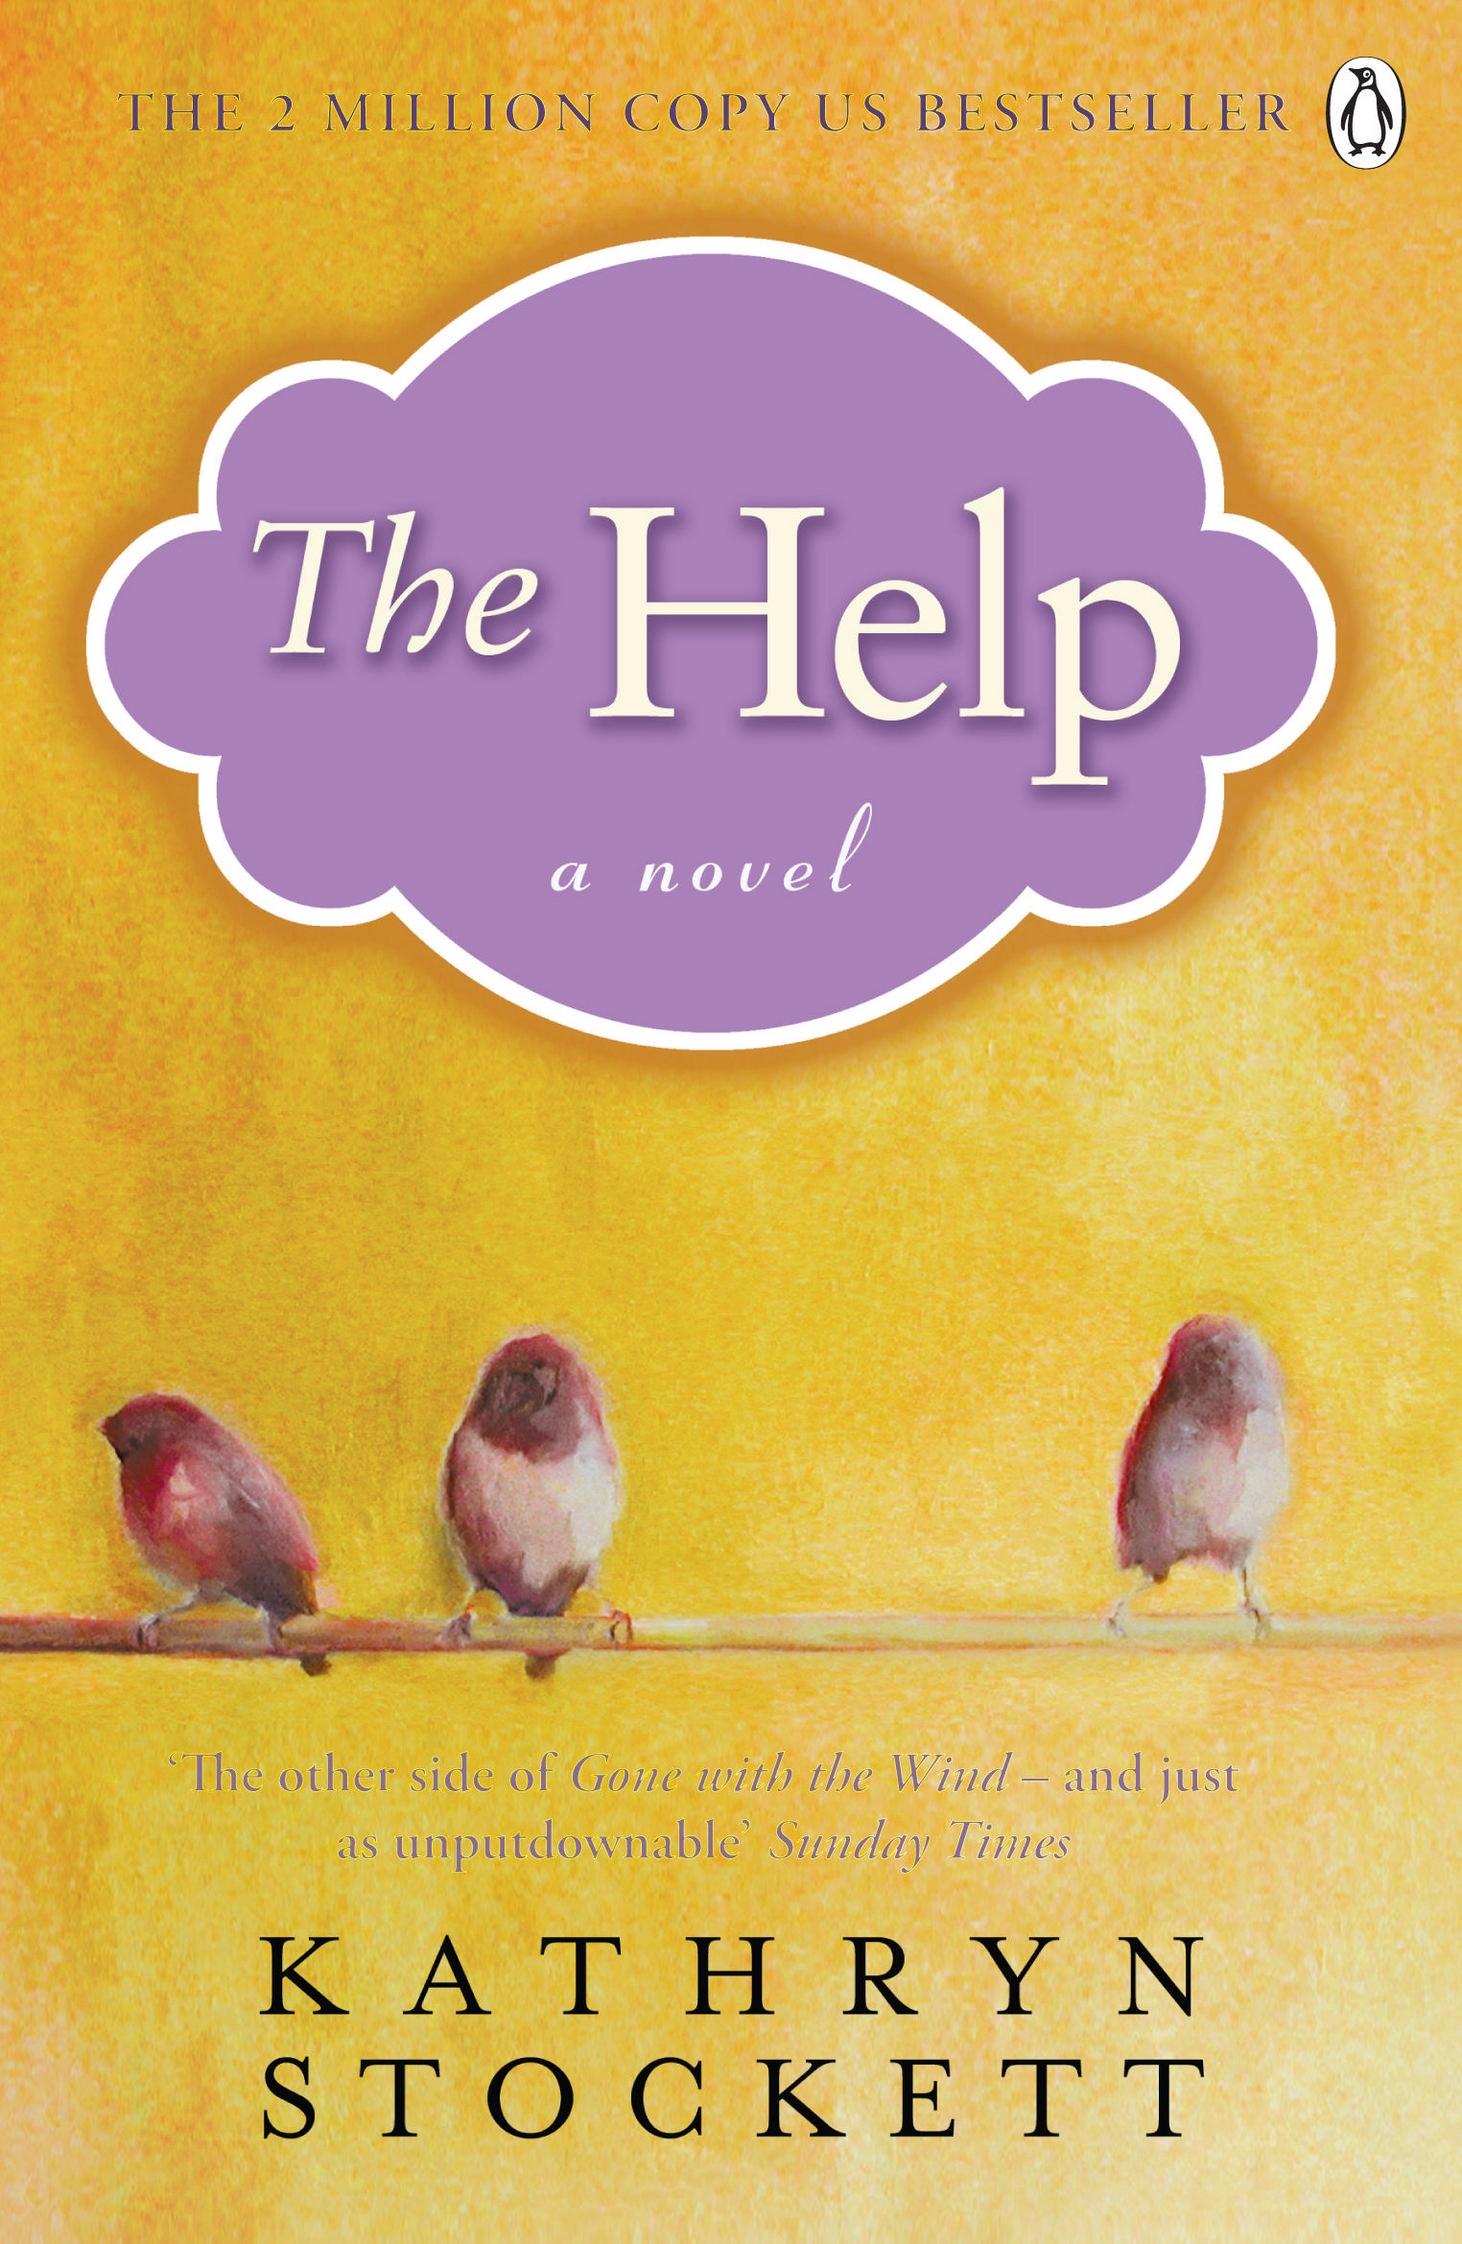 TOP 10 Teen Self-Help Books - amazoncom